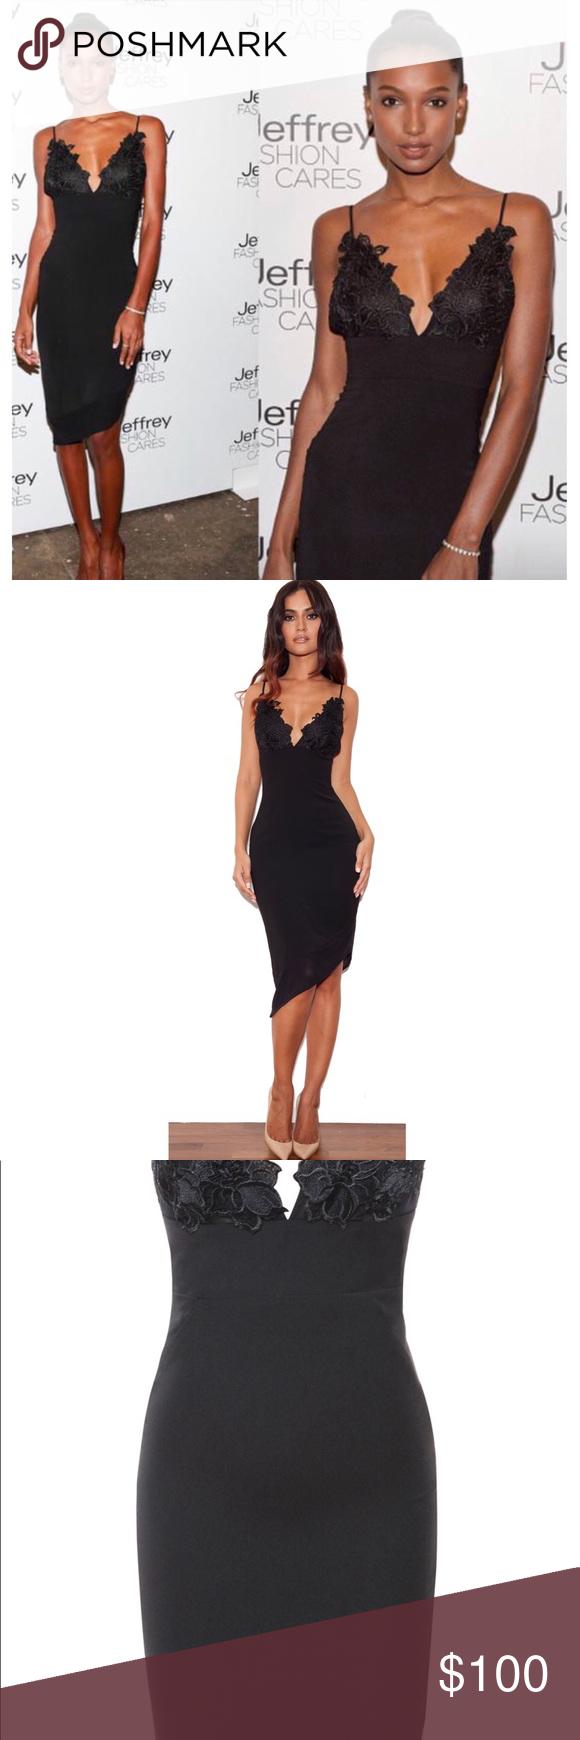 302f01fcc177 Caprice Black Slip Dress With Lace Applique - raveitsafe